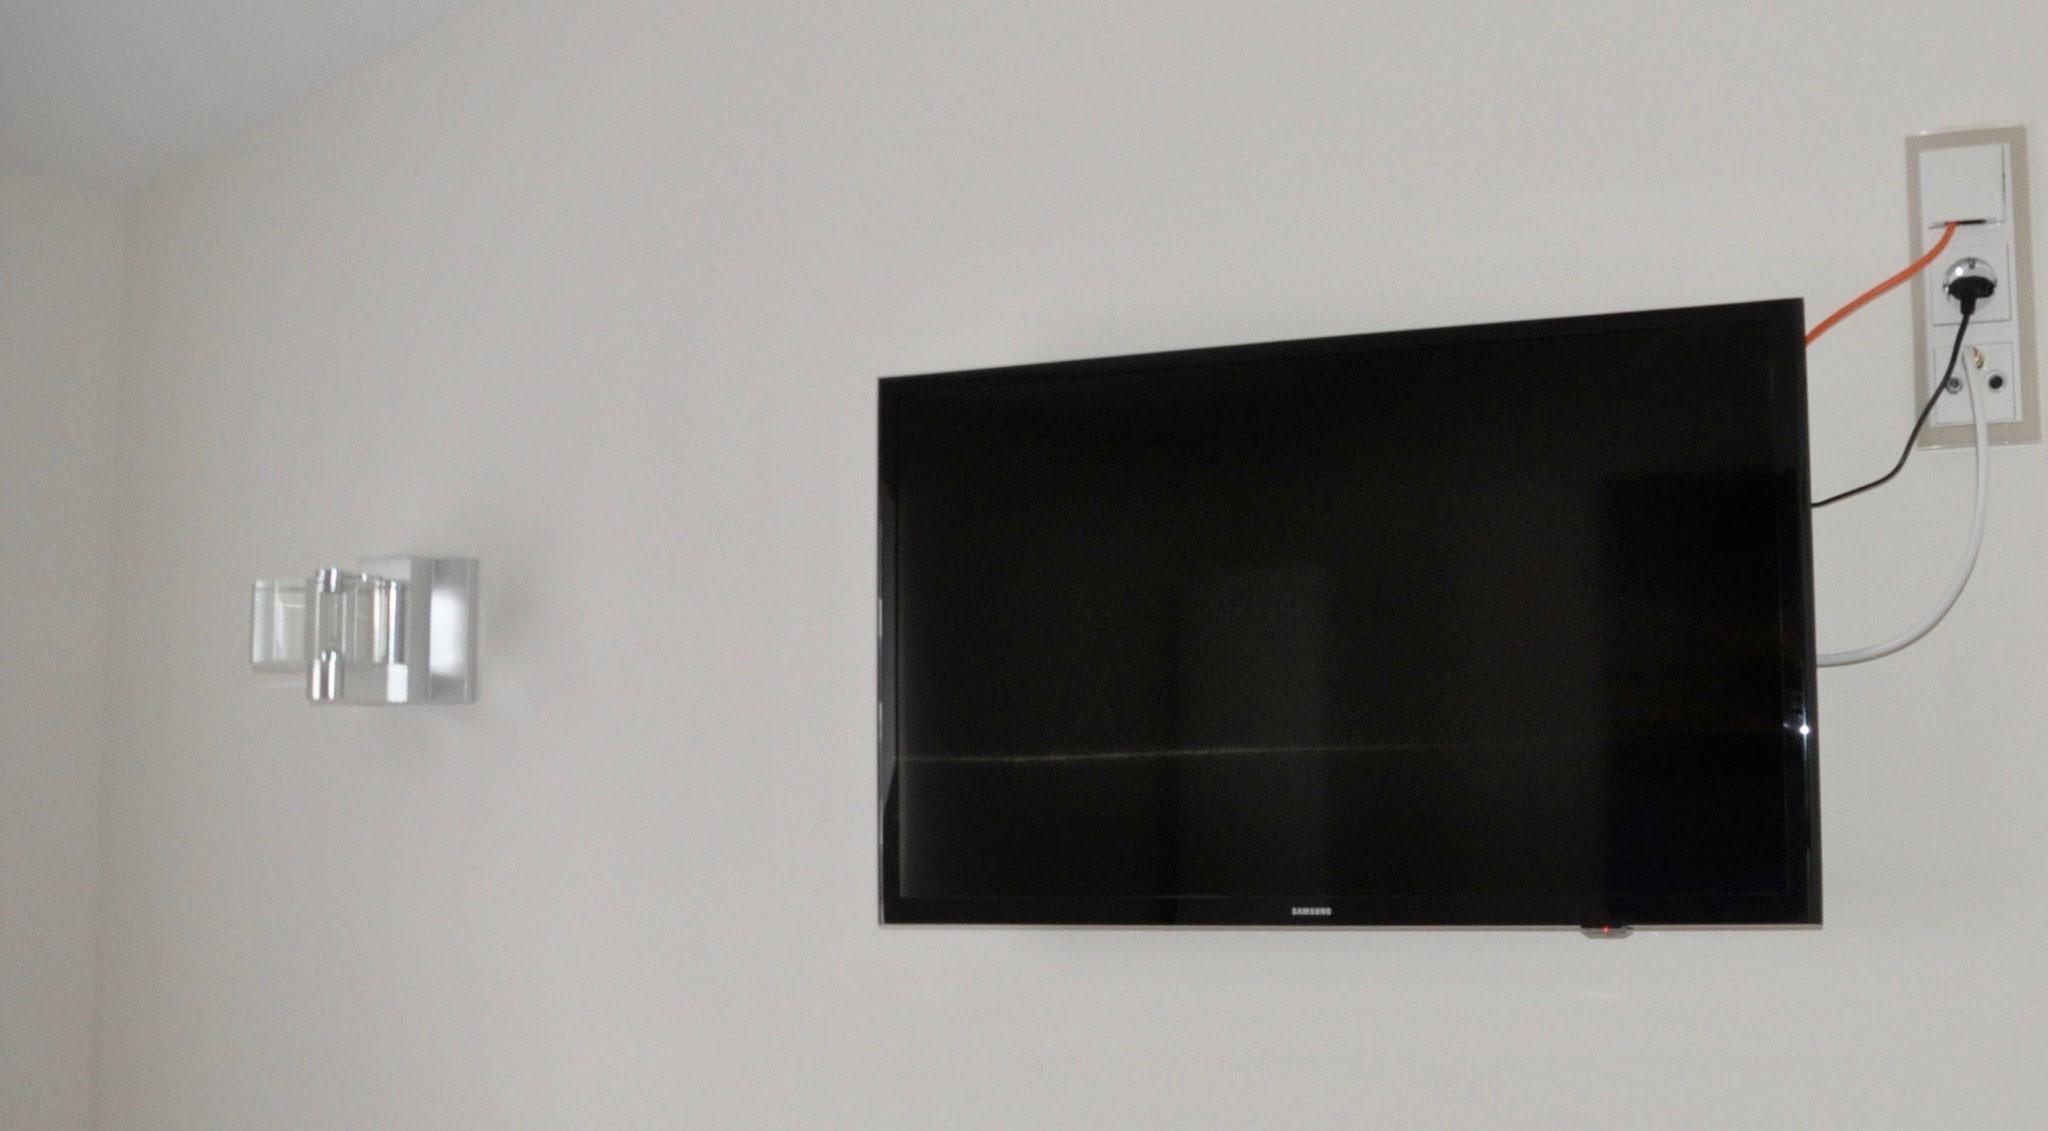 Smart TV Zimmer 2